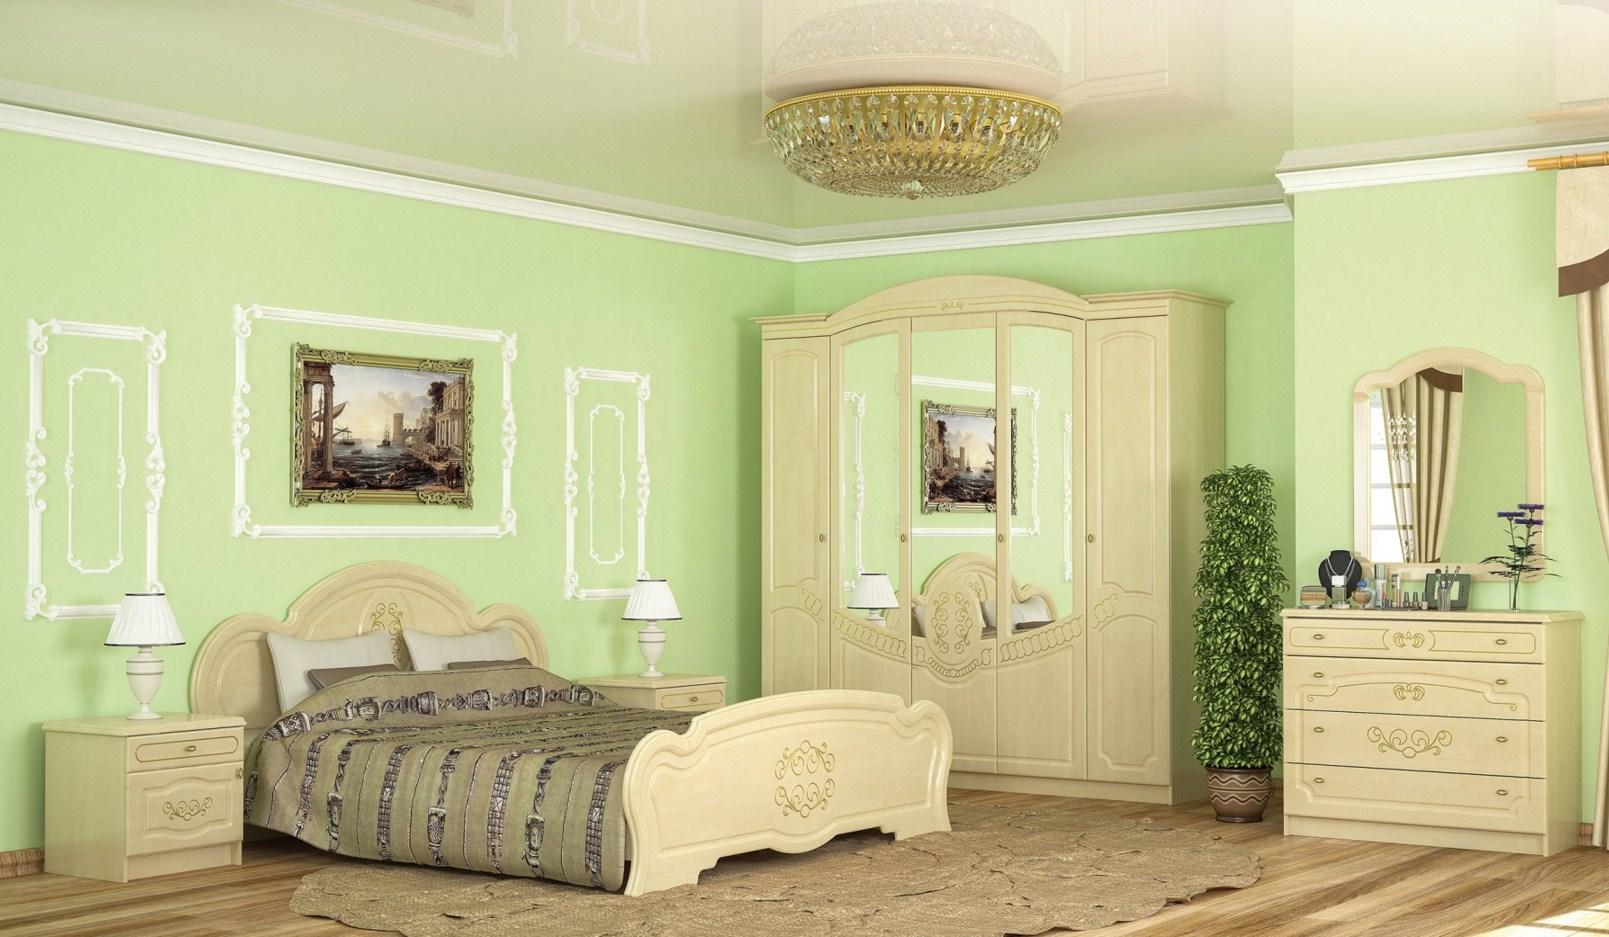 Корпусная спальная мебель